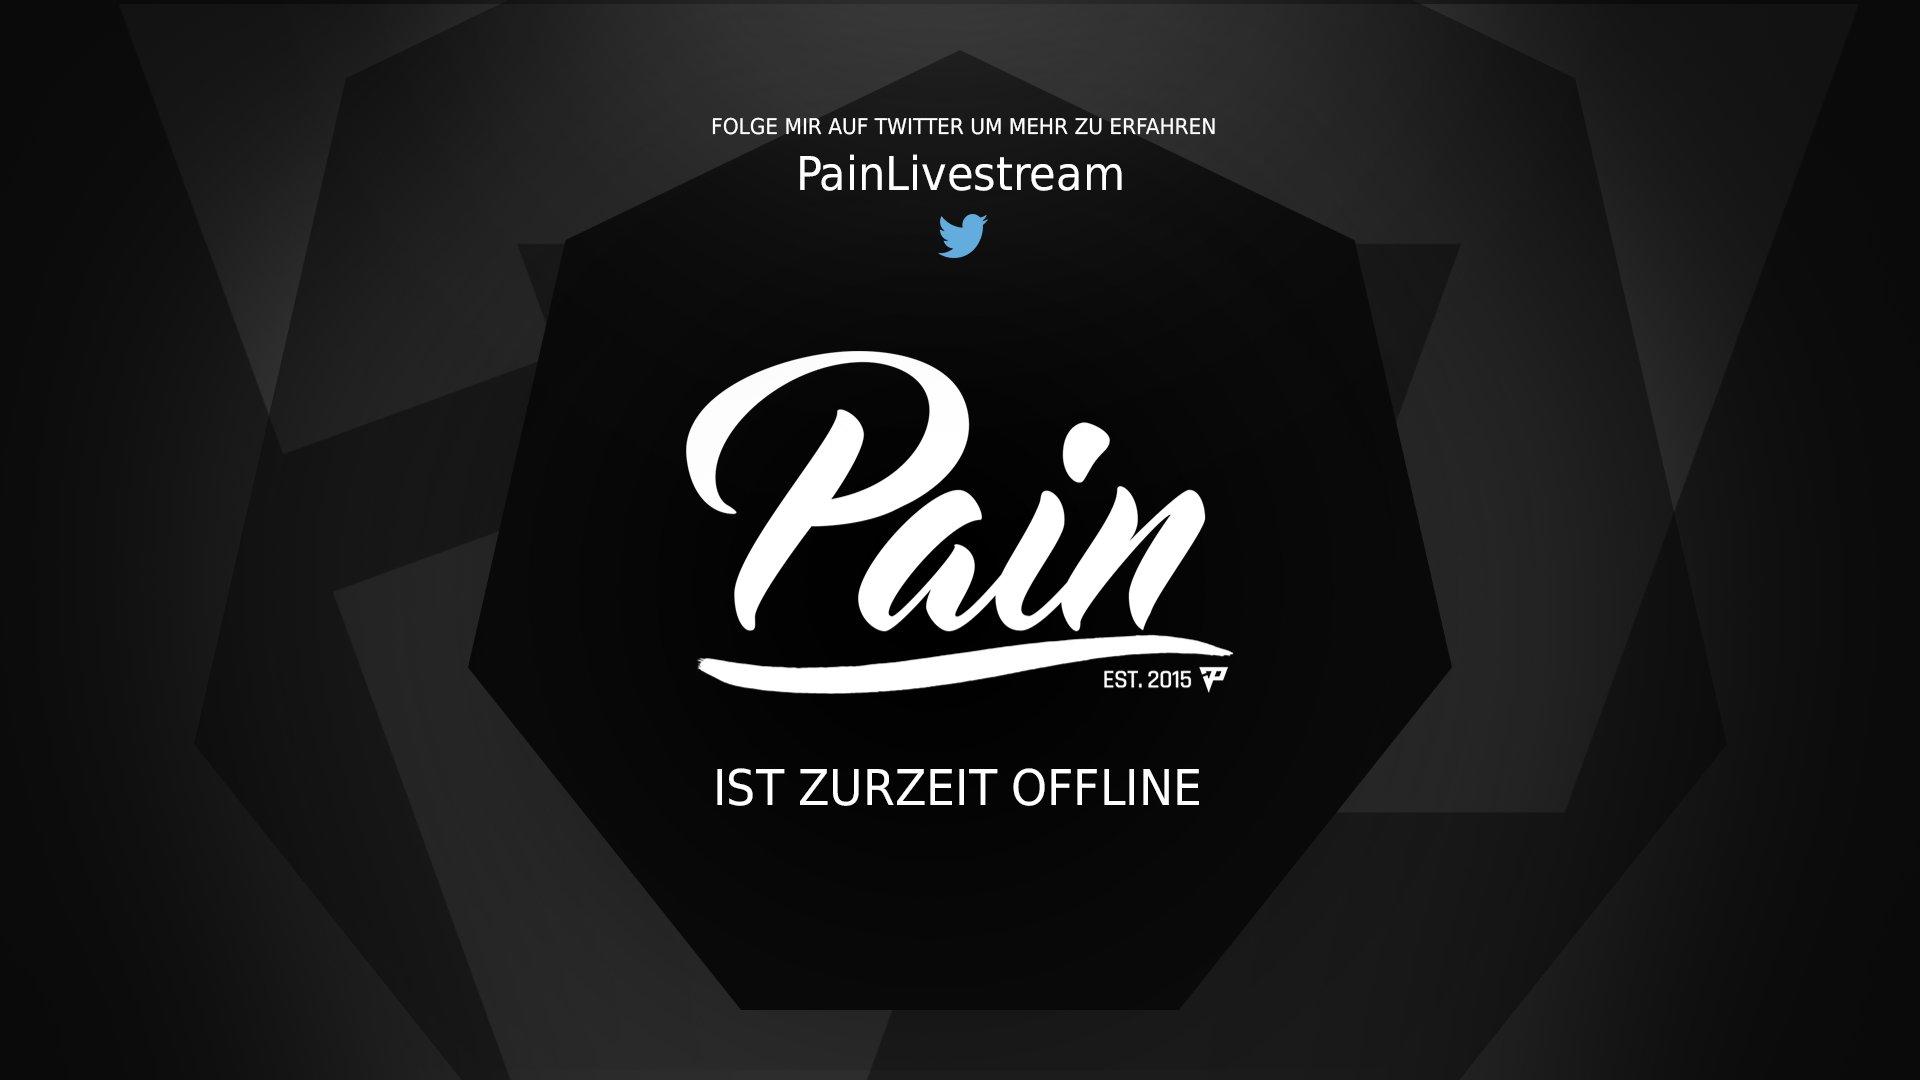 Twitch stream of PainLivestream